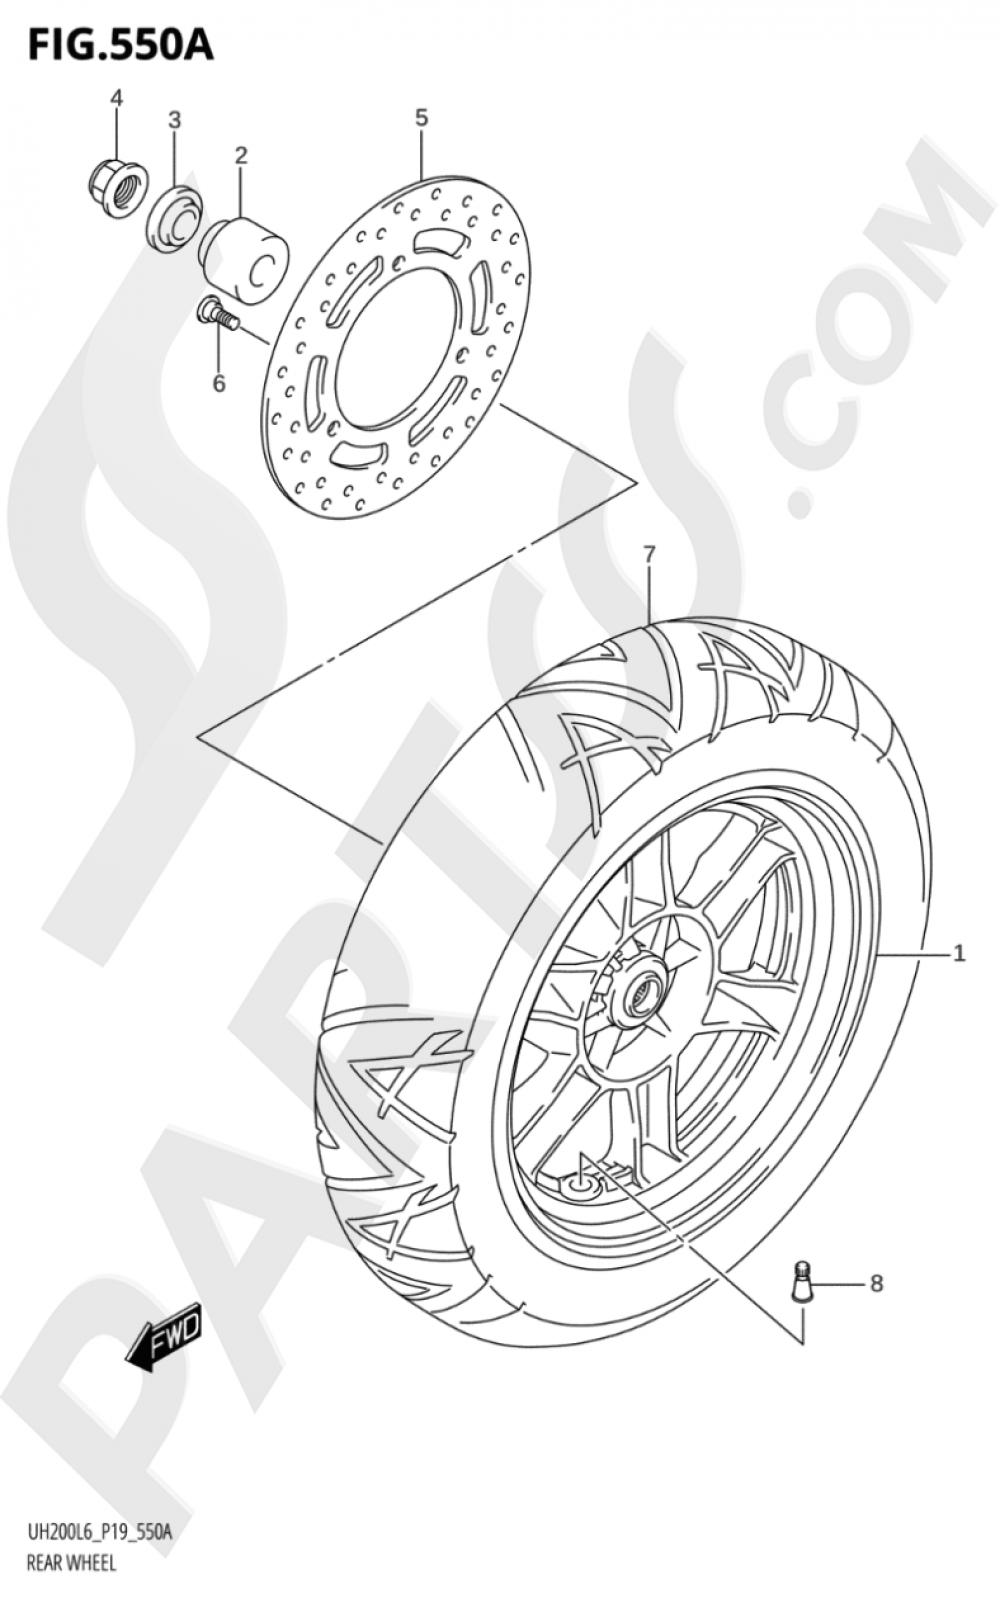 550A - REAR WHEEL (UH200L6 P19) Suzuki BURGMAN UH200A 2016